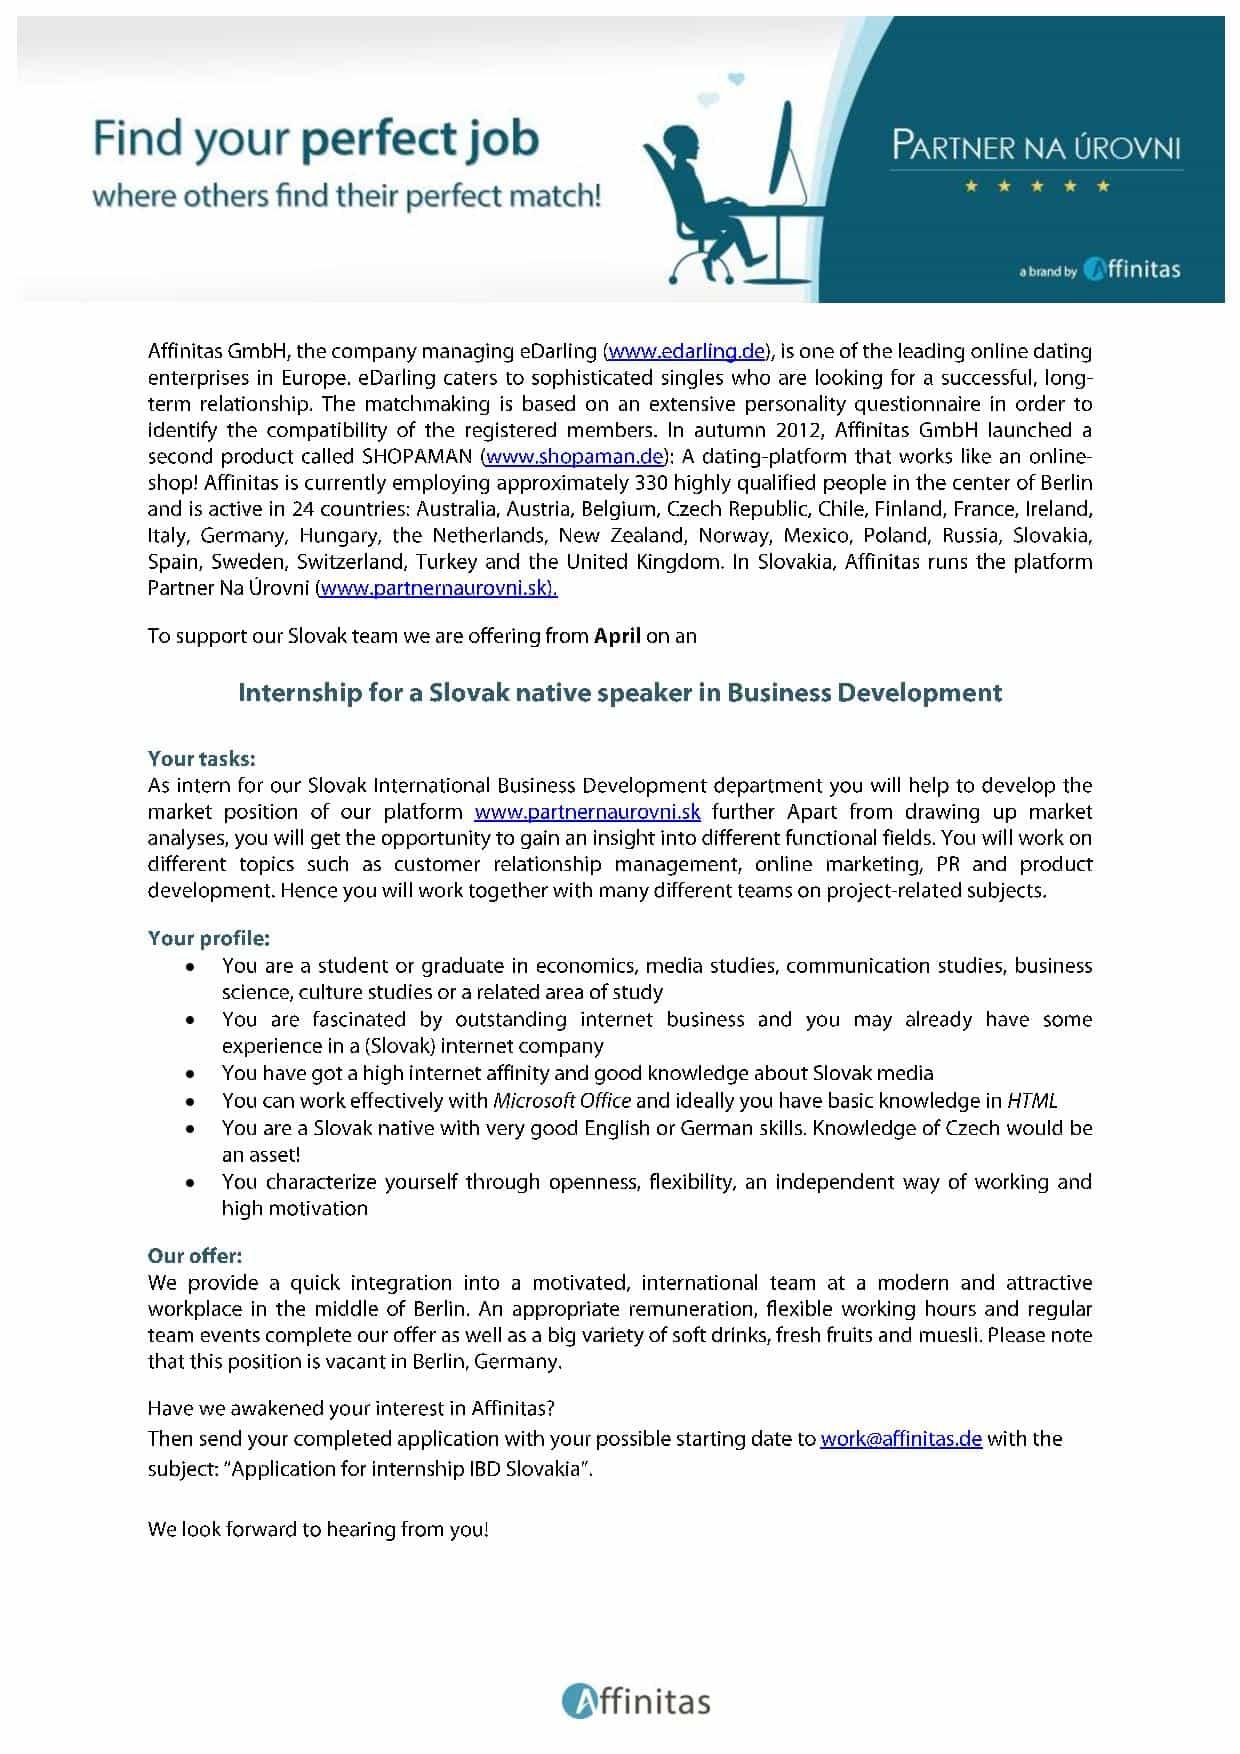 Affinitas internship IBD Slovakia